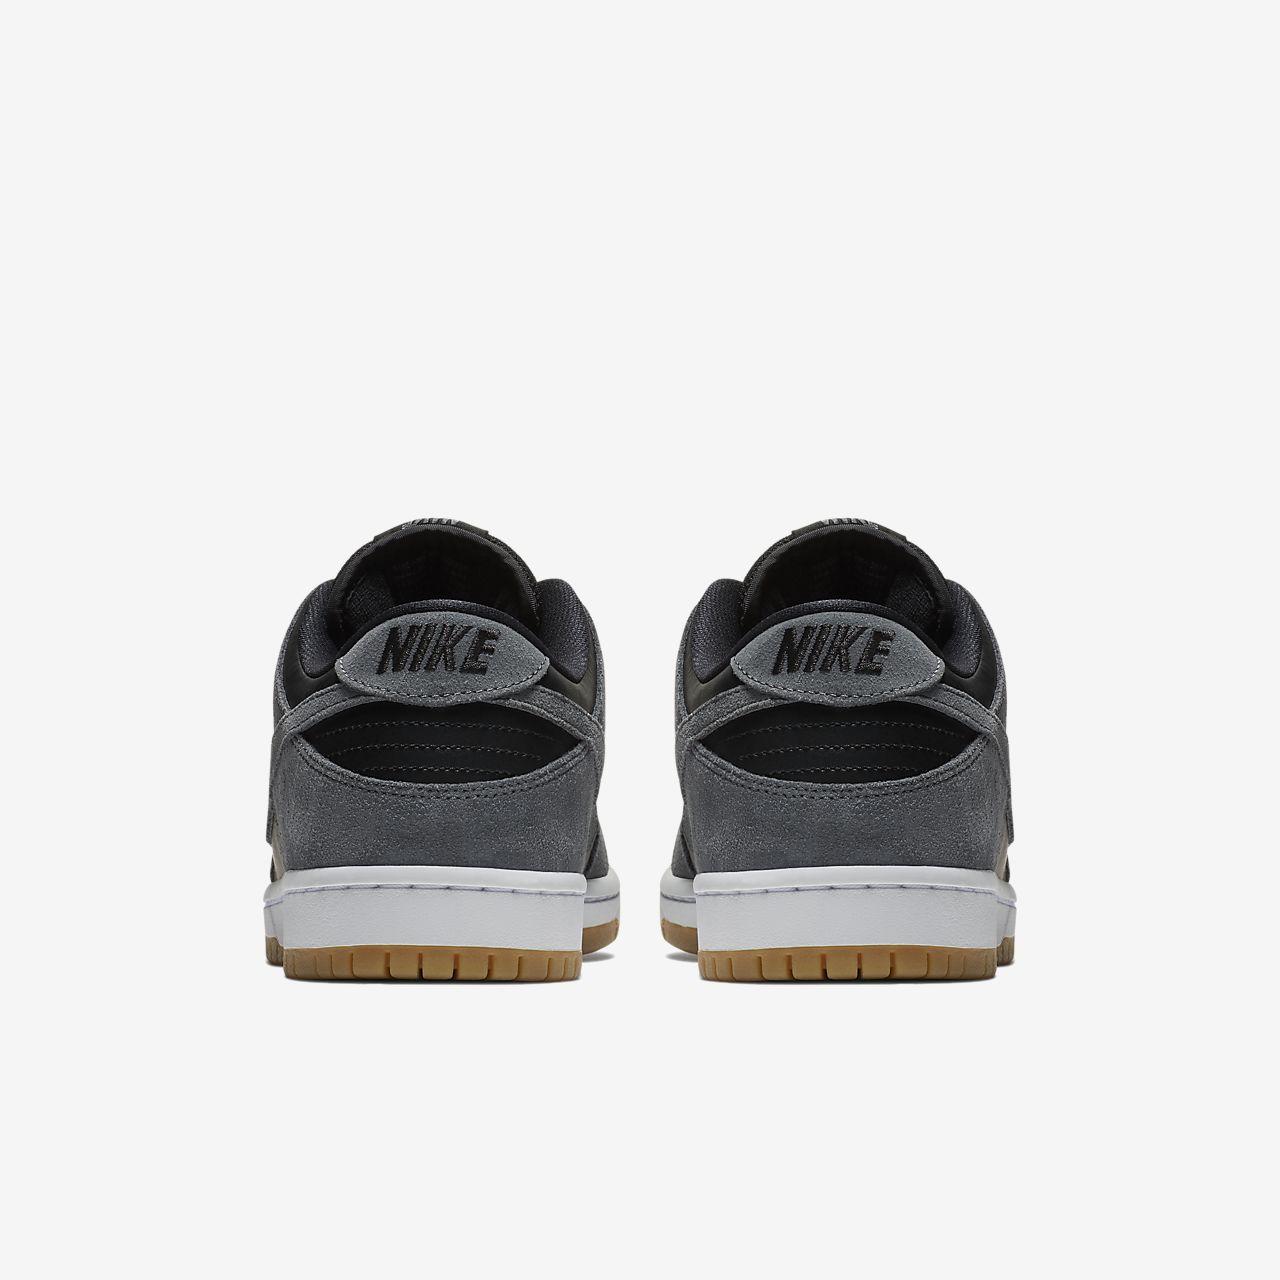 online store 44967 5152b ... Nike SB Dunk Low TRD Mens Skateboarding Shoe